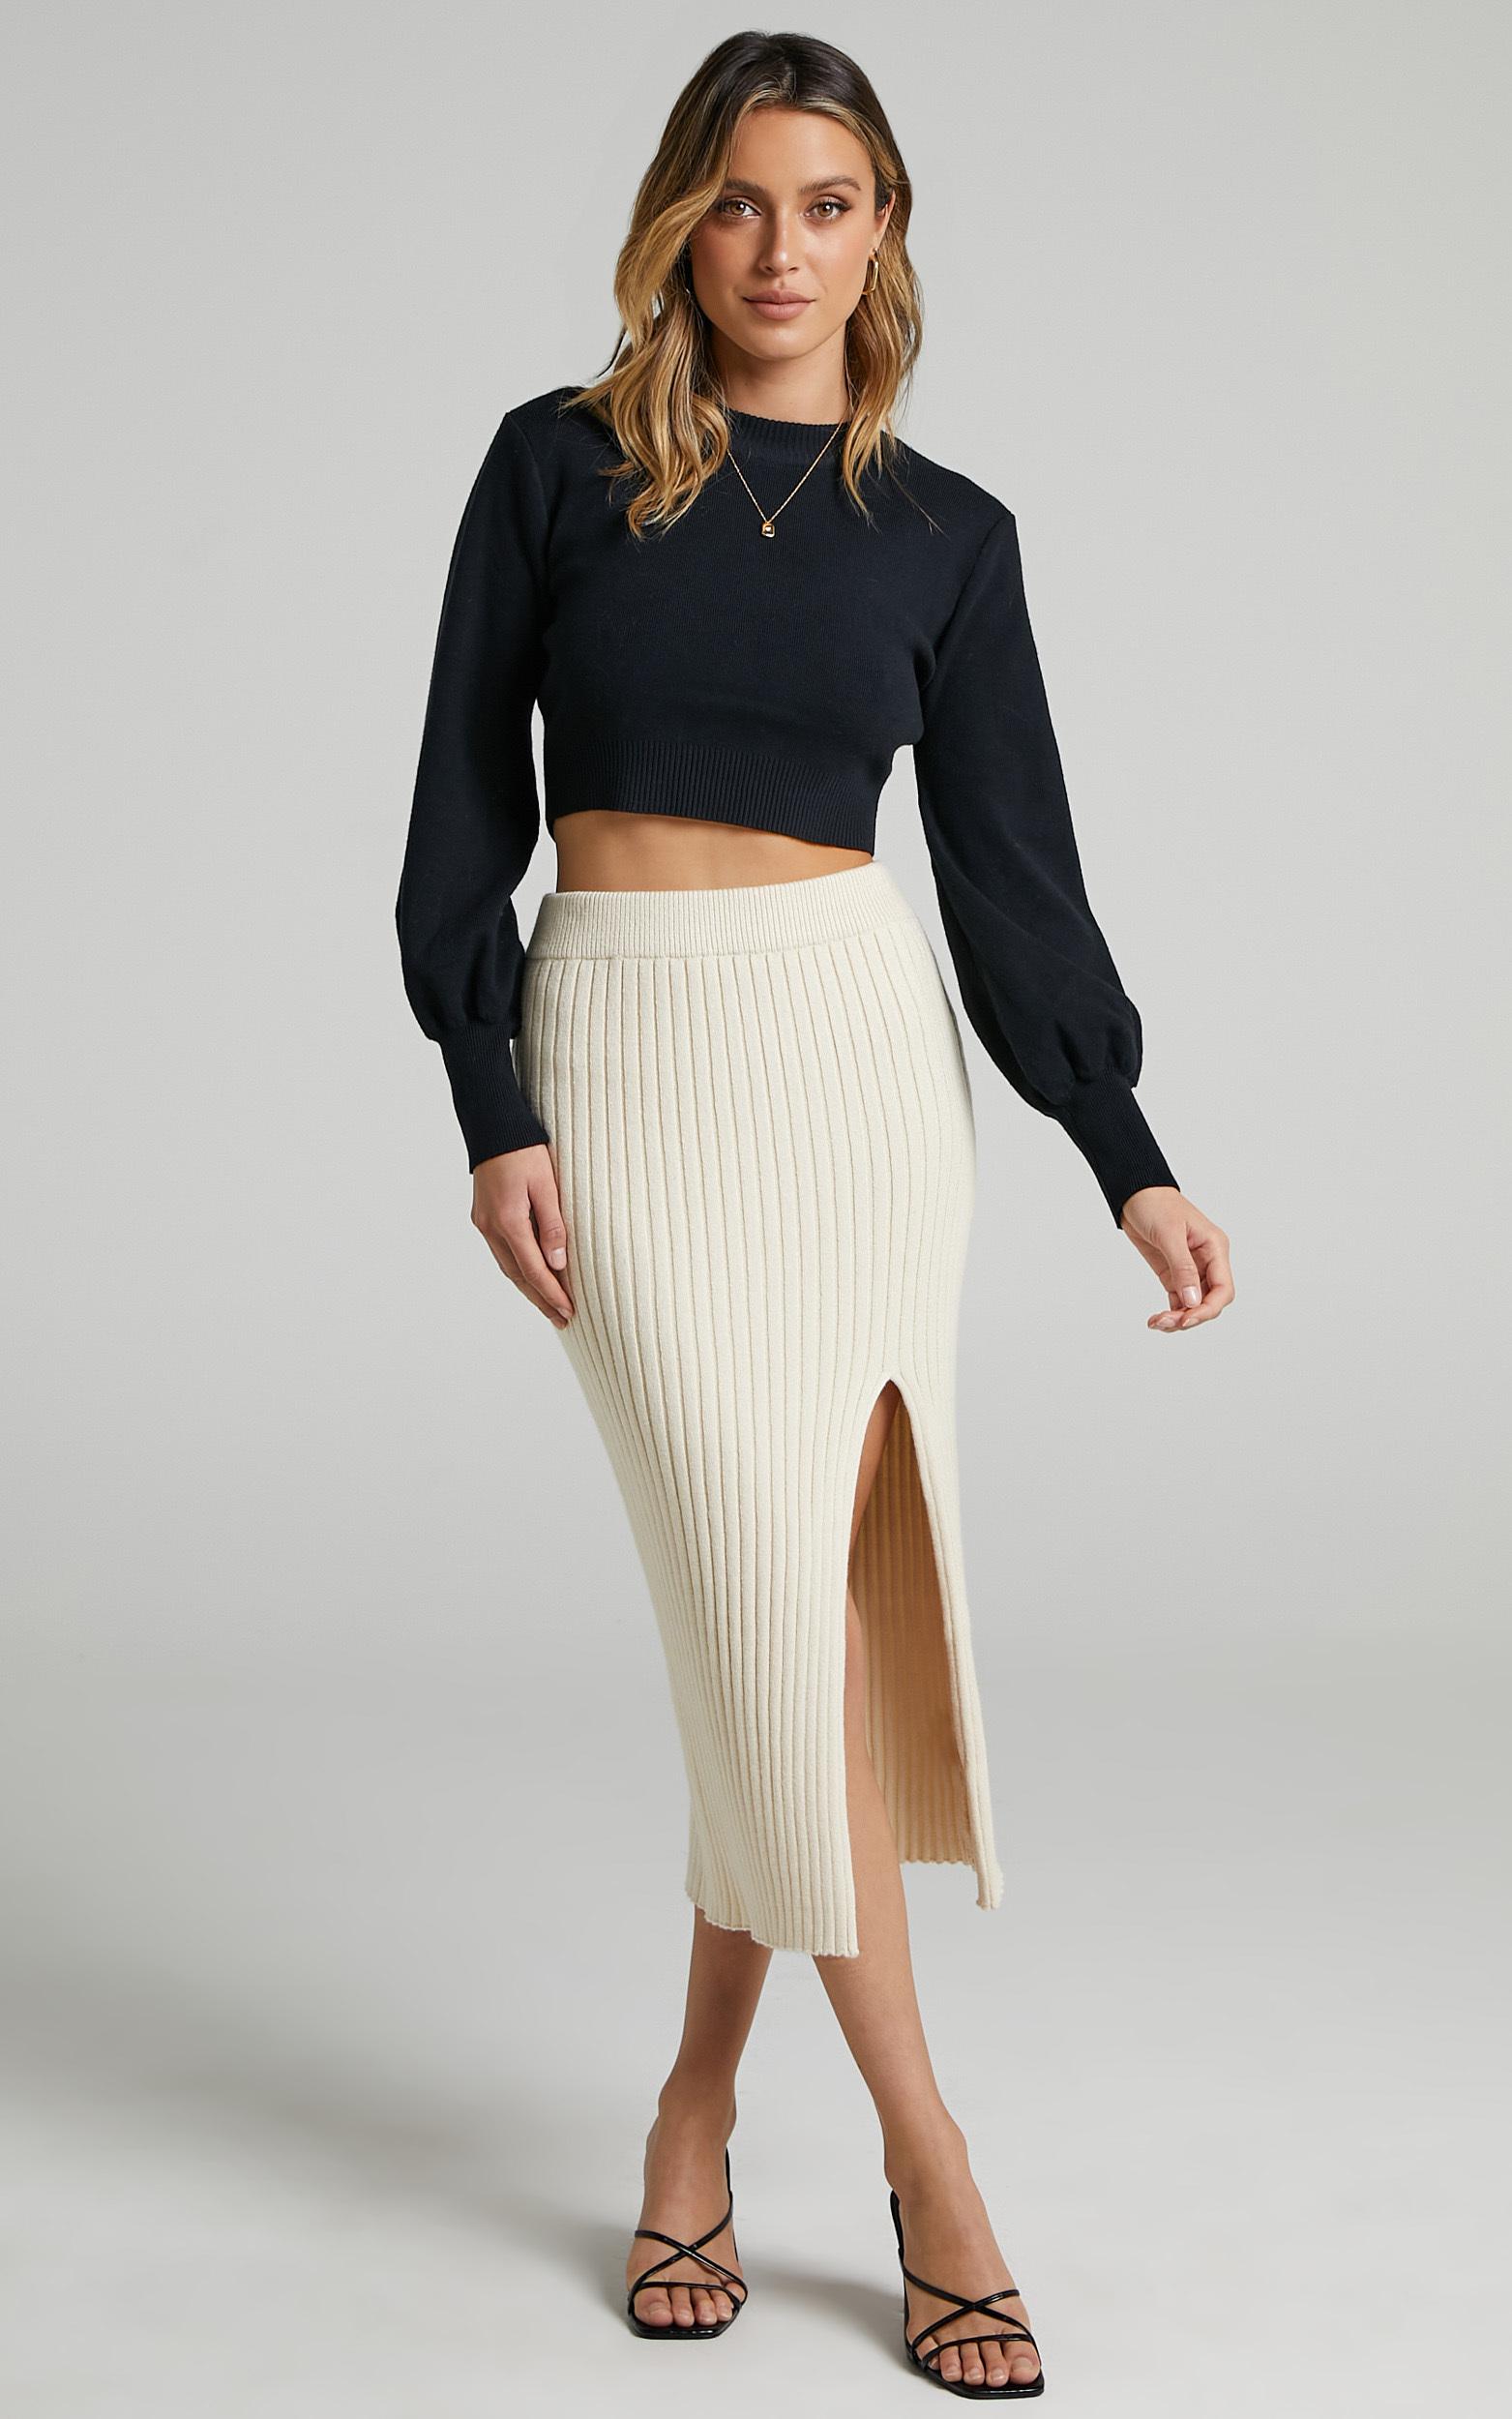 Rib Knit Midi Skirt with split in Beige - 04, BRN1, hi-res image number null